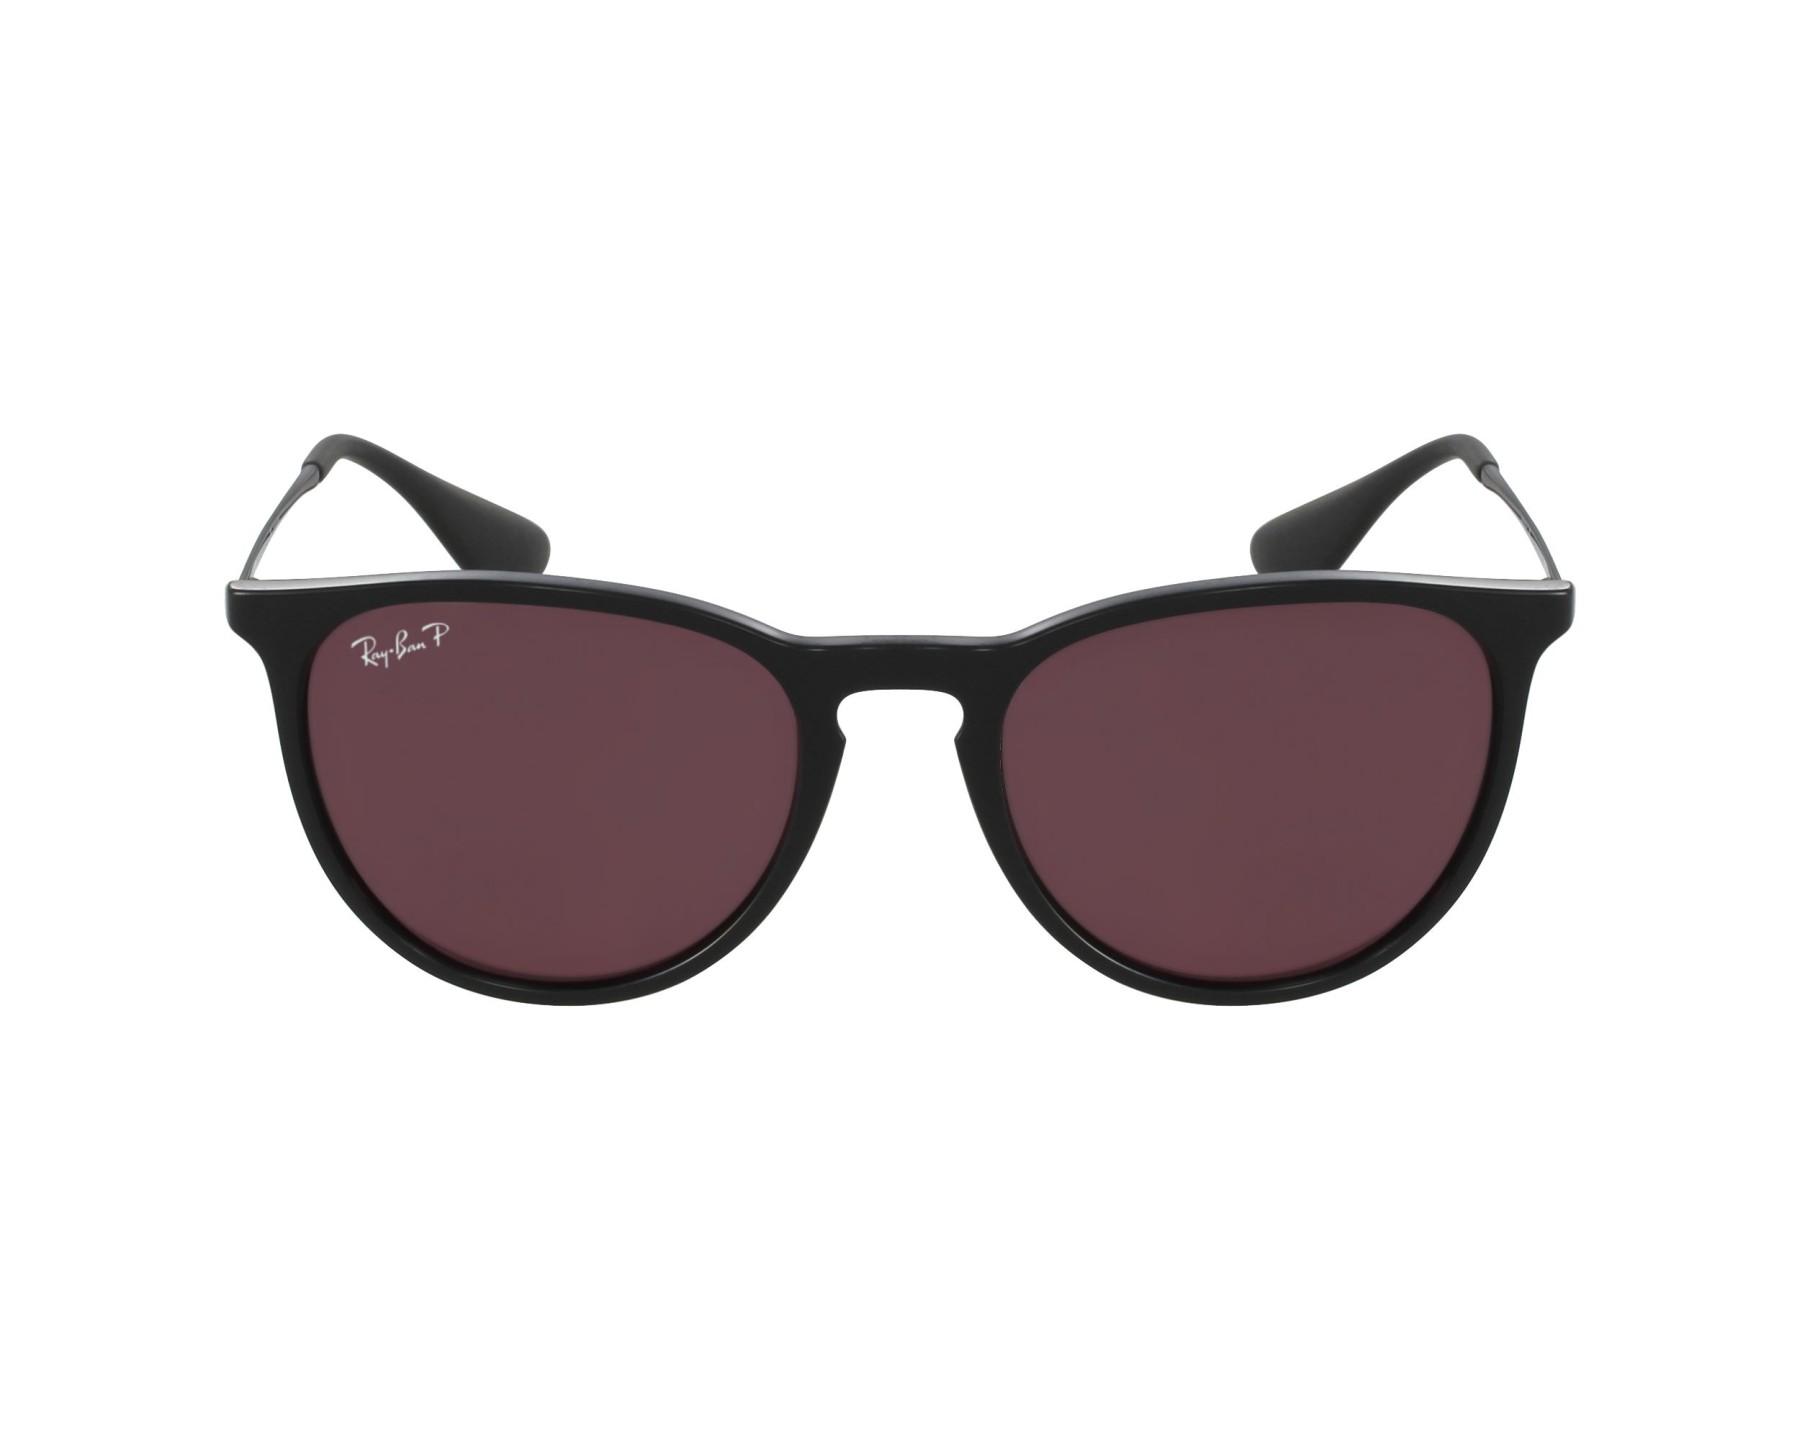 b1c21f8410b thumbnail Sunglasses Ray-Ban RB-4171 601 5Q - Black profile view